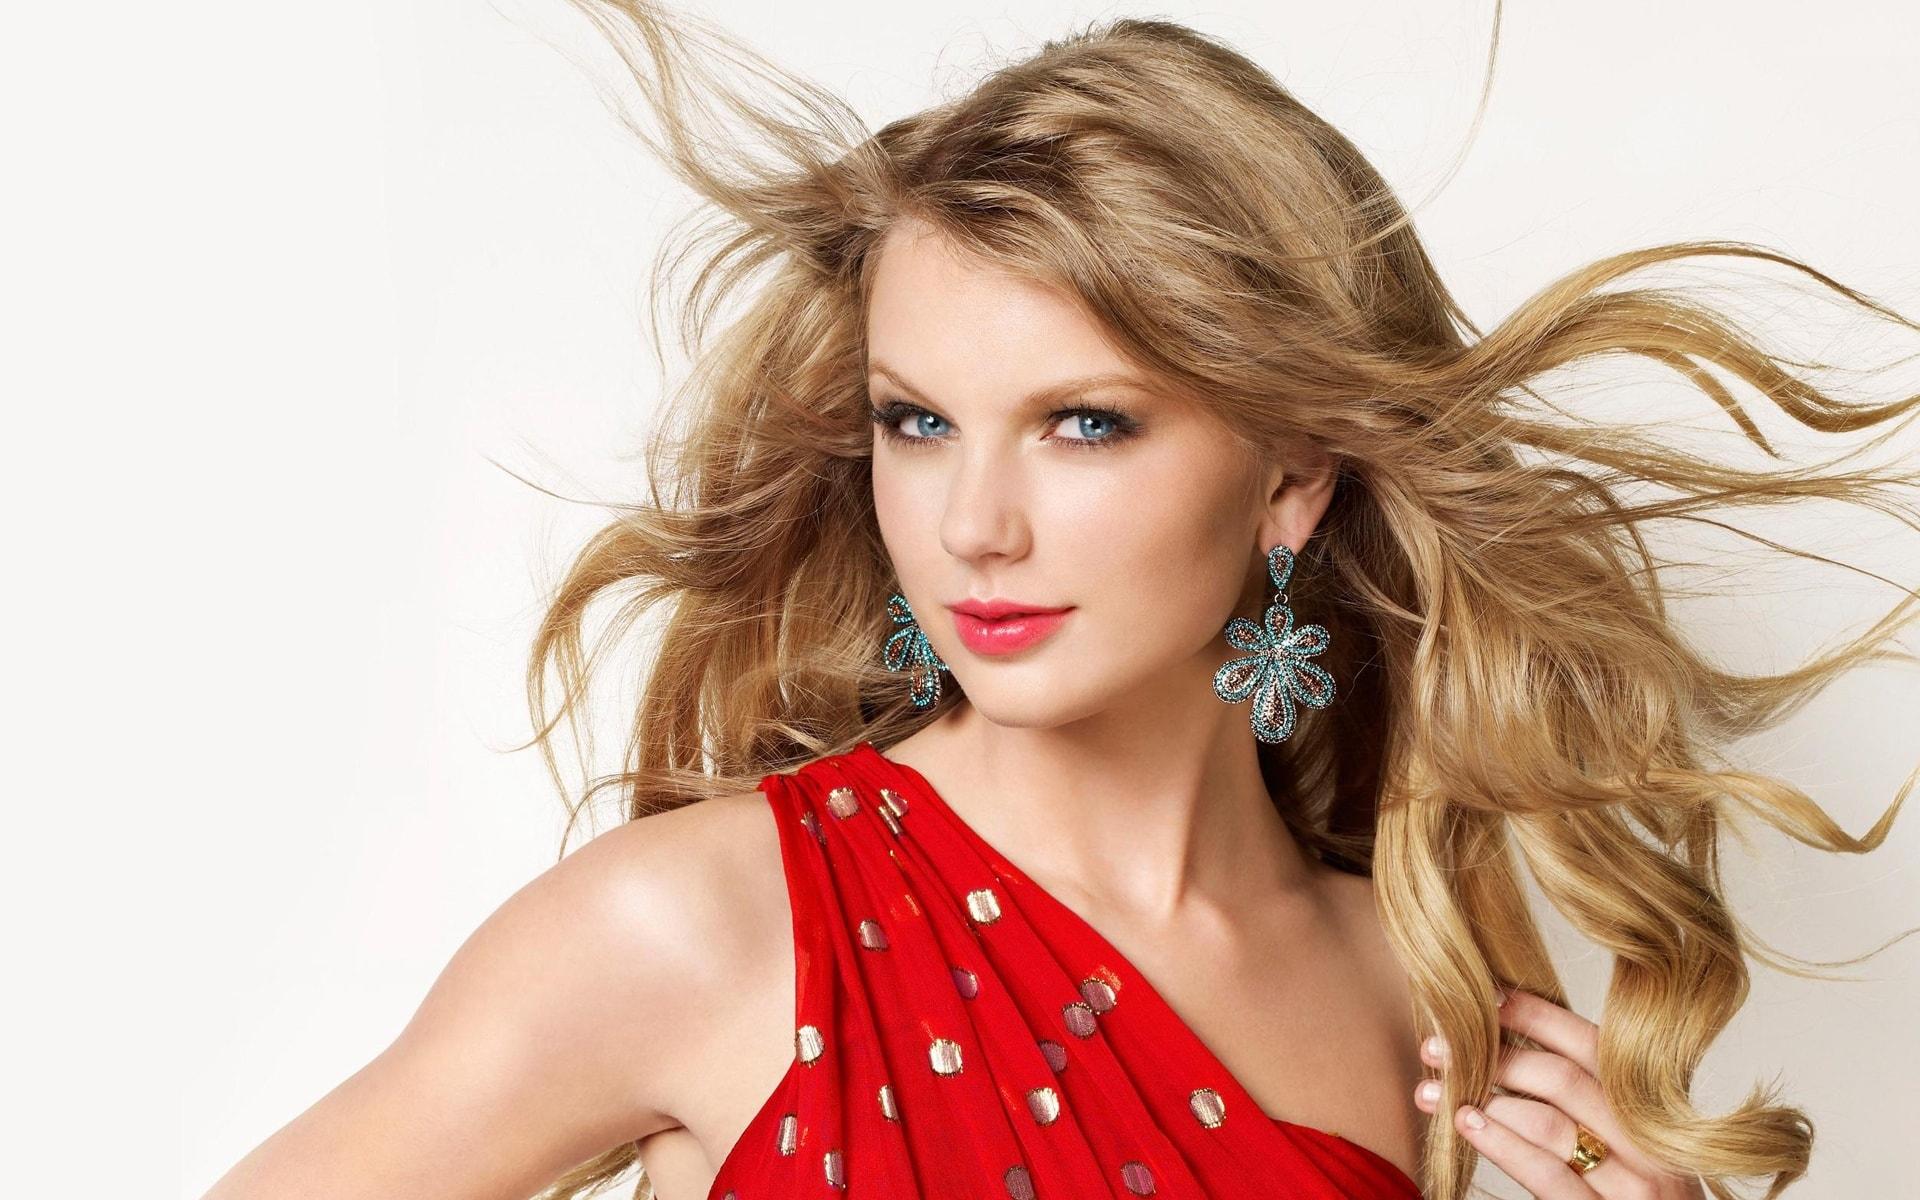 Taylor Swift widescreen for desktop